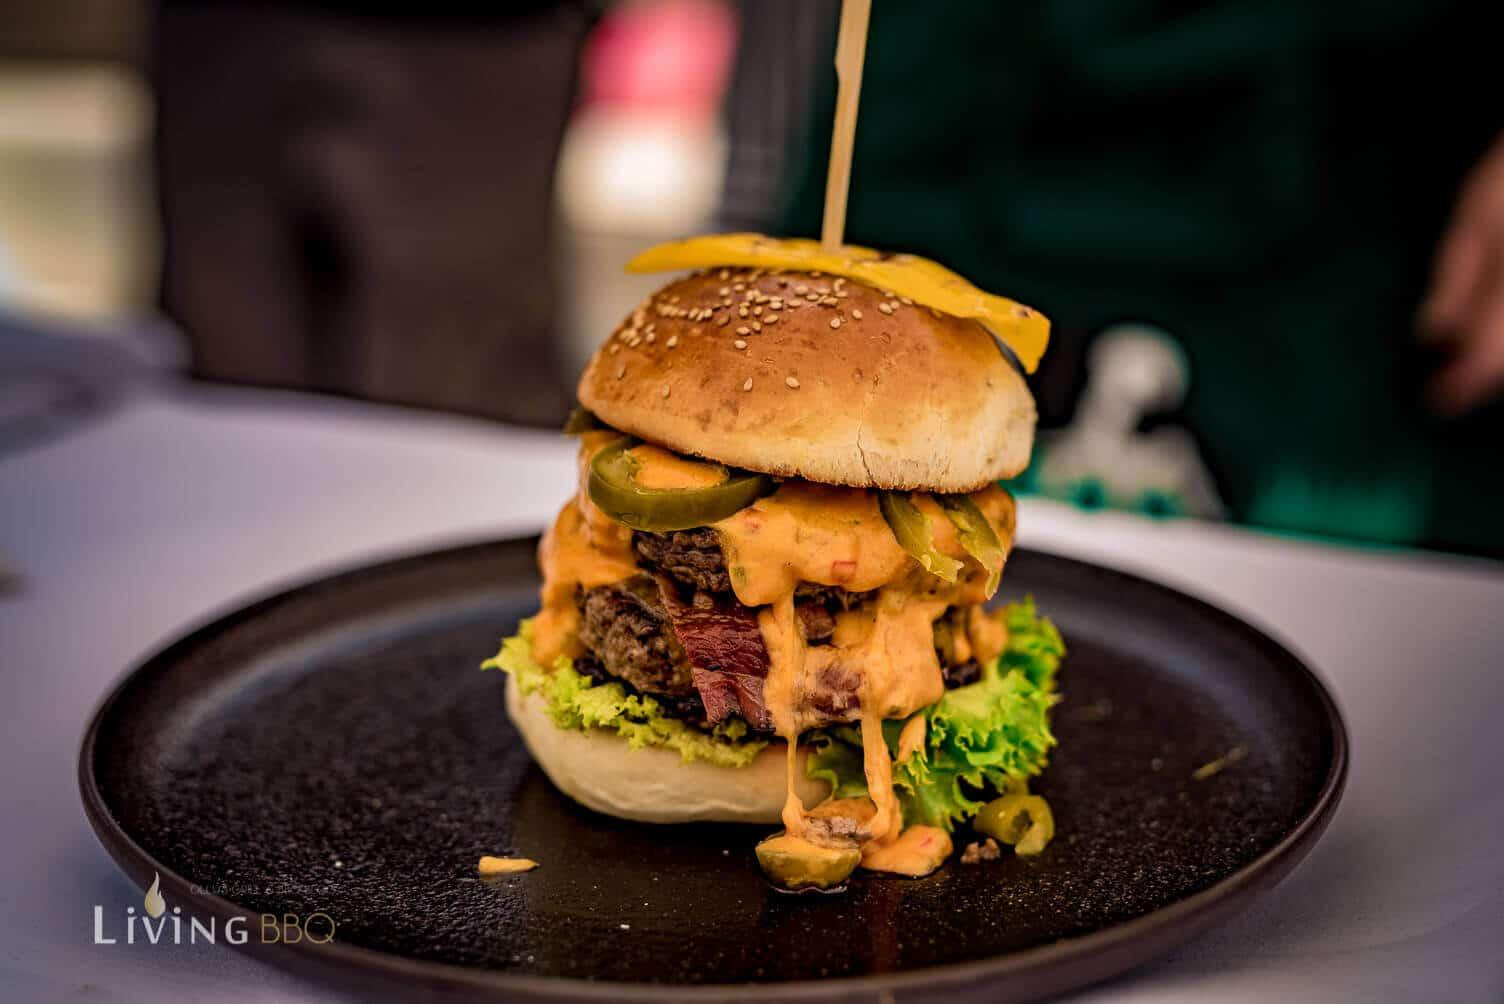 Cheddar Burger [object object]_Kerrygold Cheddar Burger Challenge 31 von 32